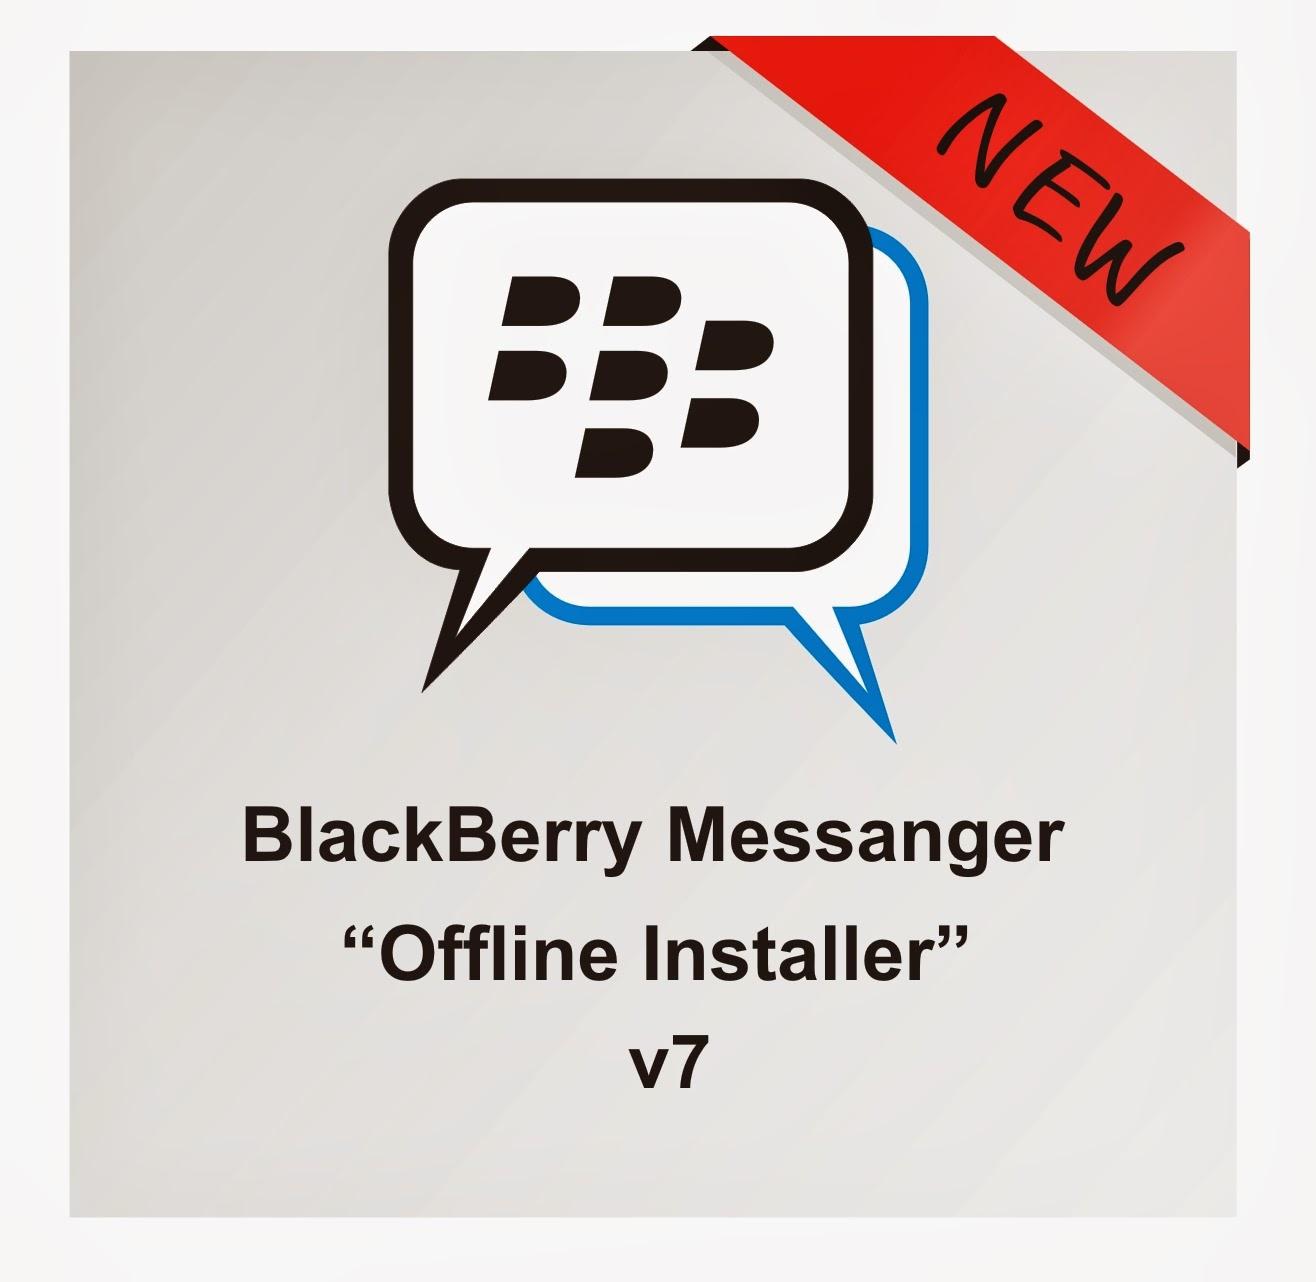 Download BlackBerry Messenger BBM BlackBerry